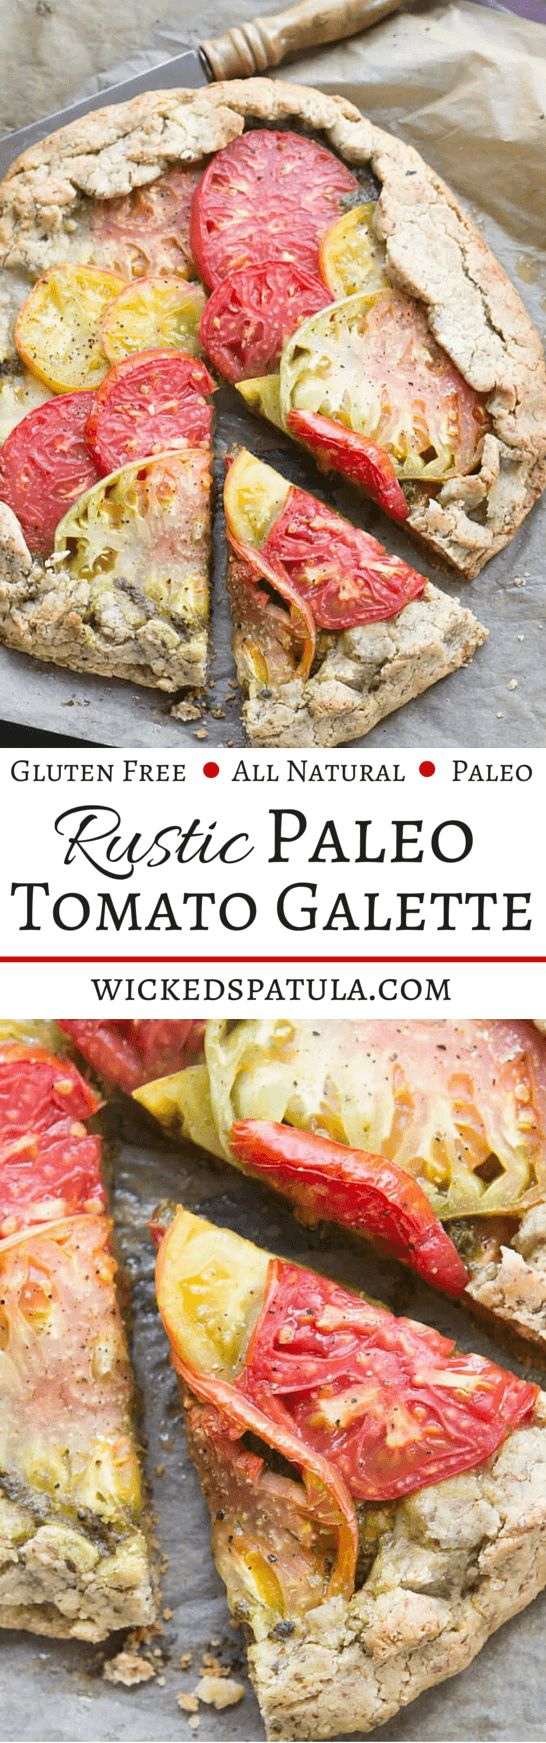 Rustic Paleo Tomato Galette with Arugula Basil Pesto   wickedspatula.com